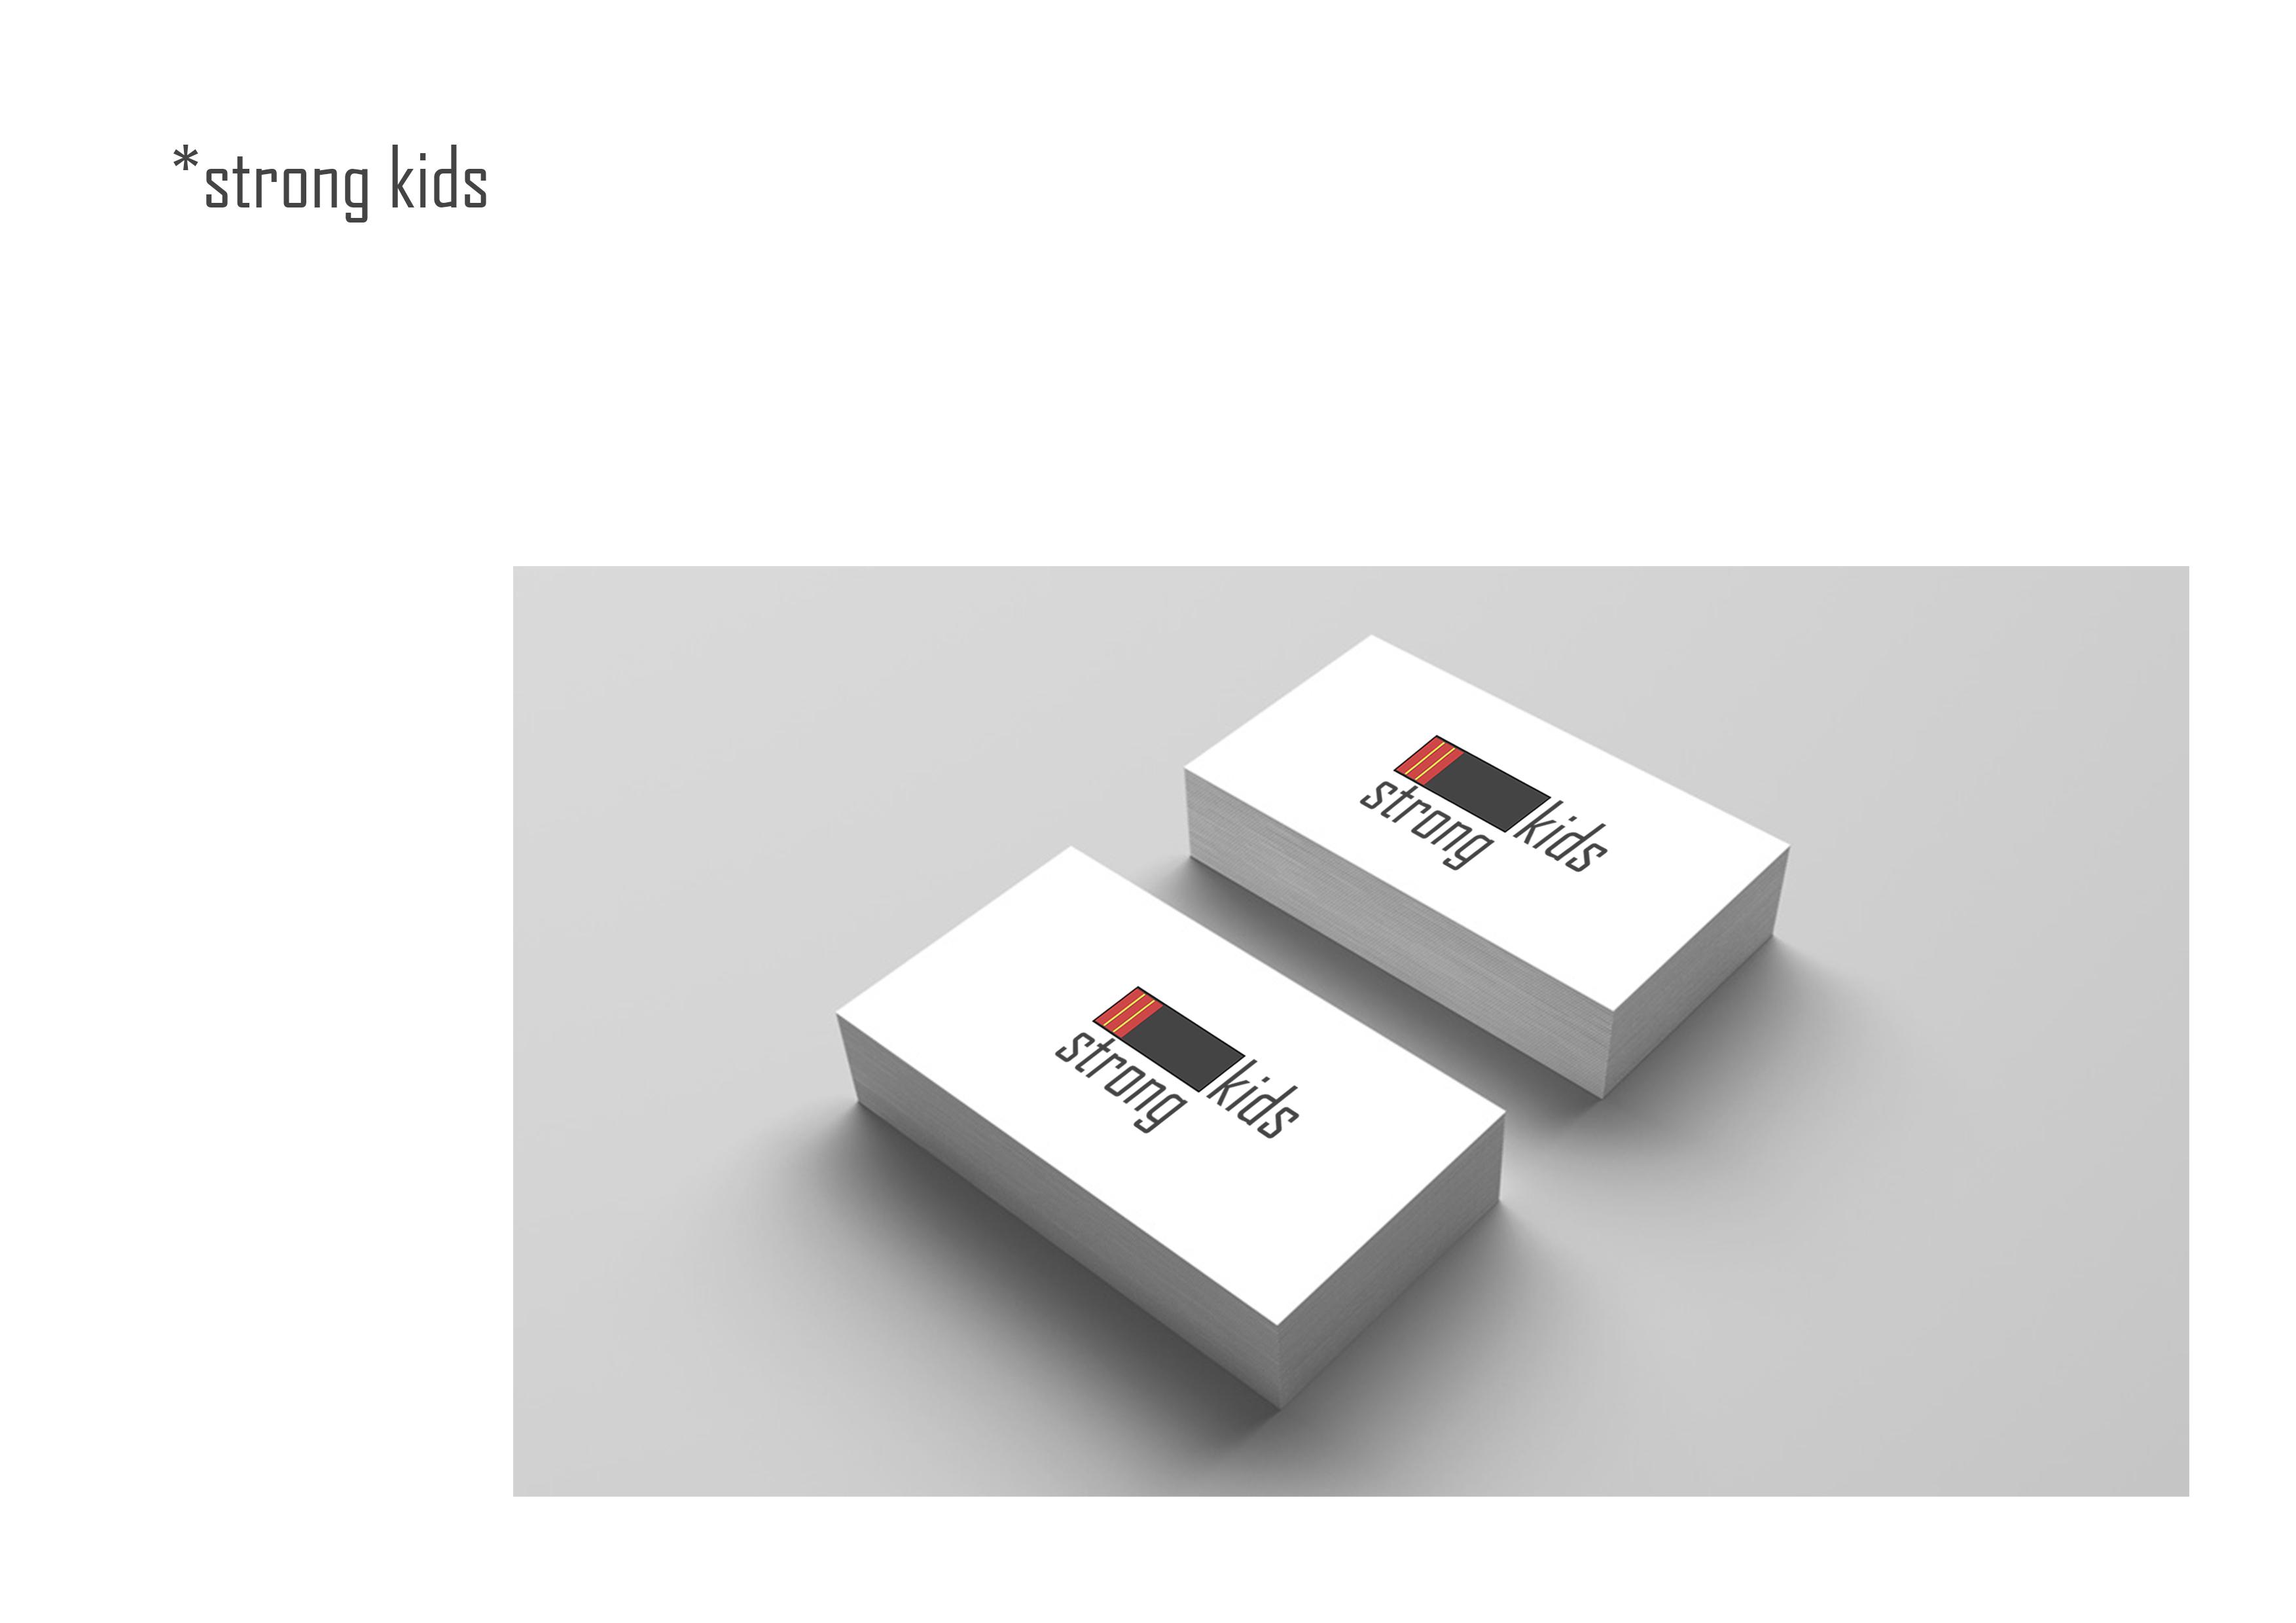 Логотип для Детского Интернет Магазина StrongKids фото f_4115c6b861e10f40.jpg